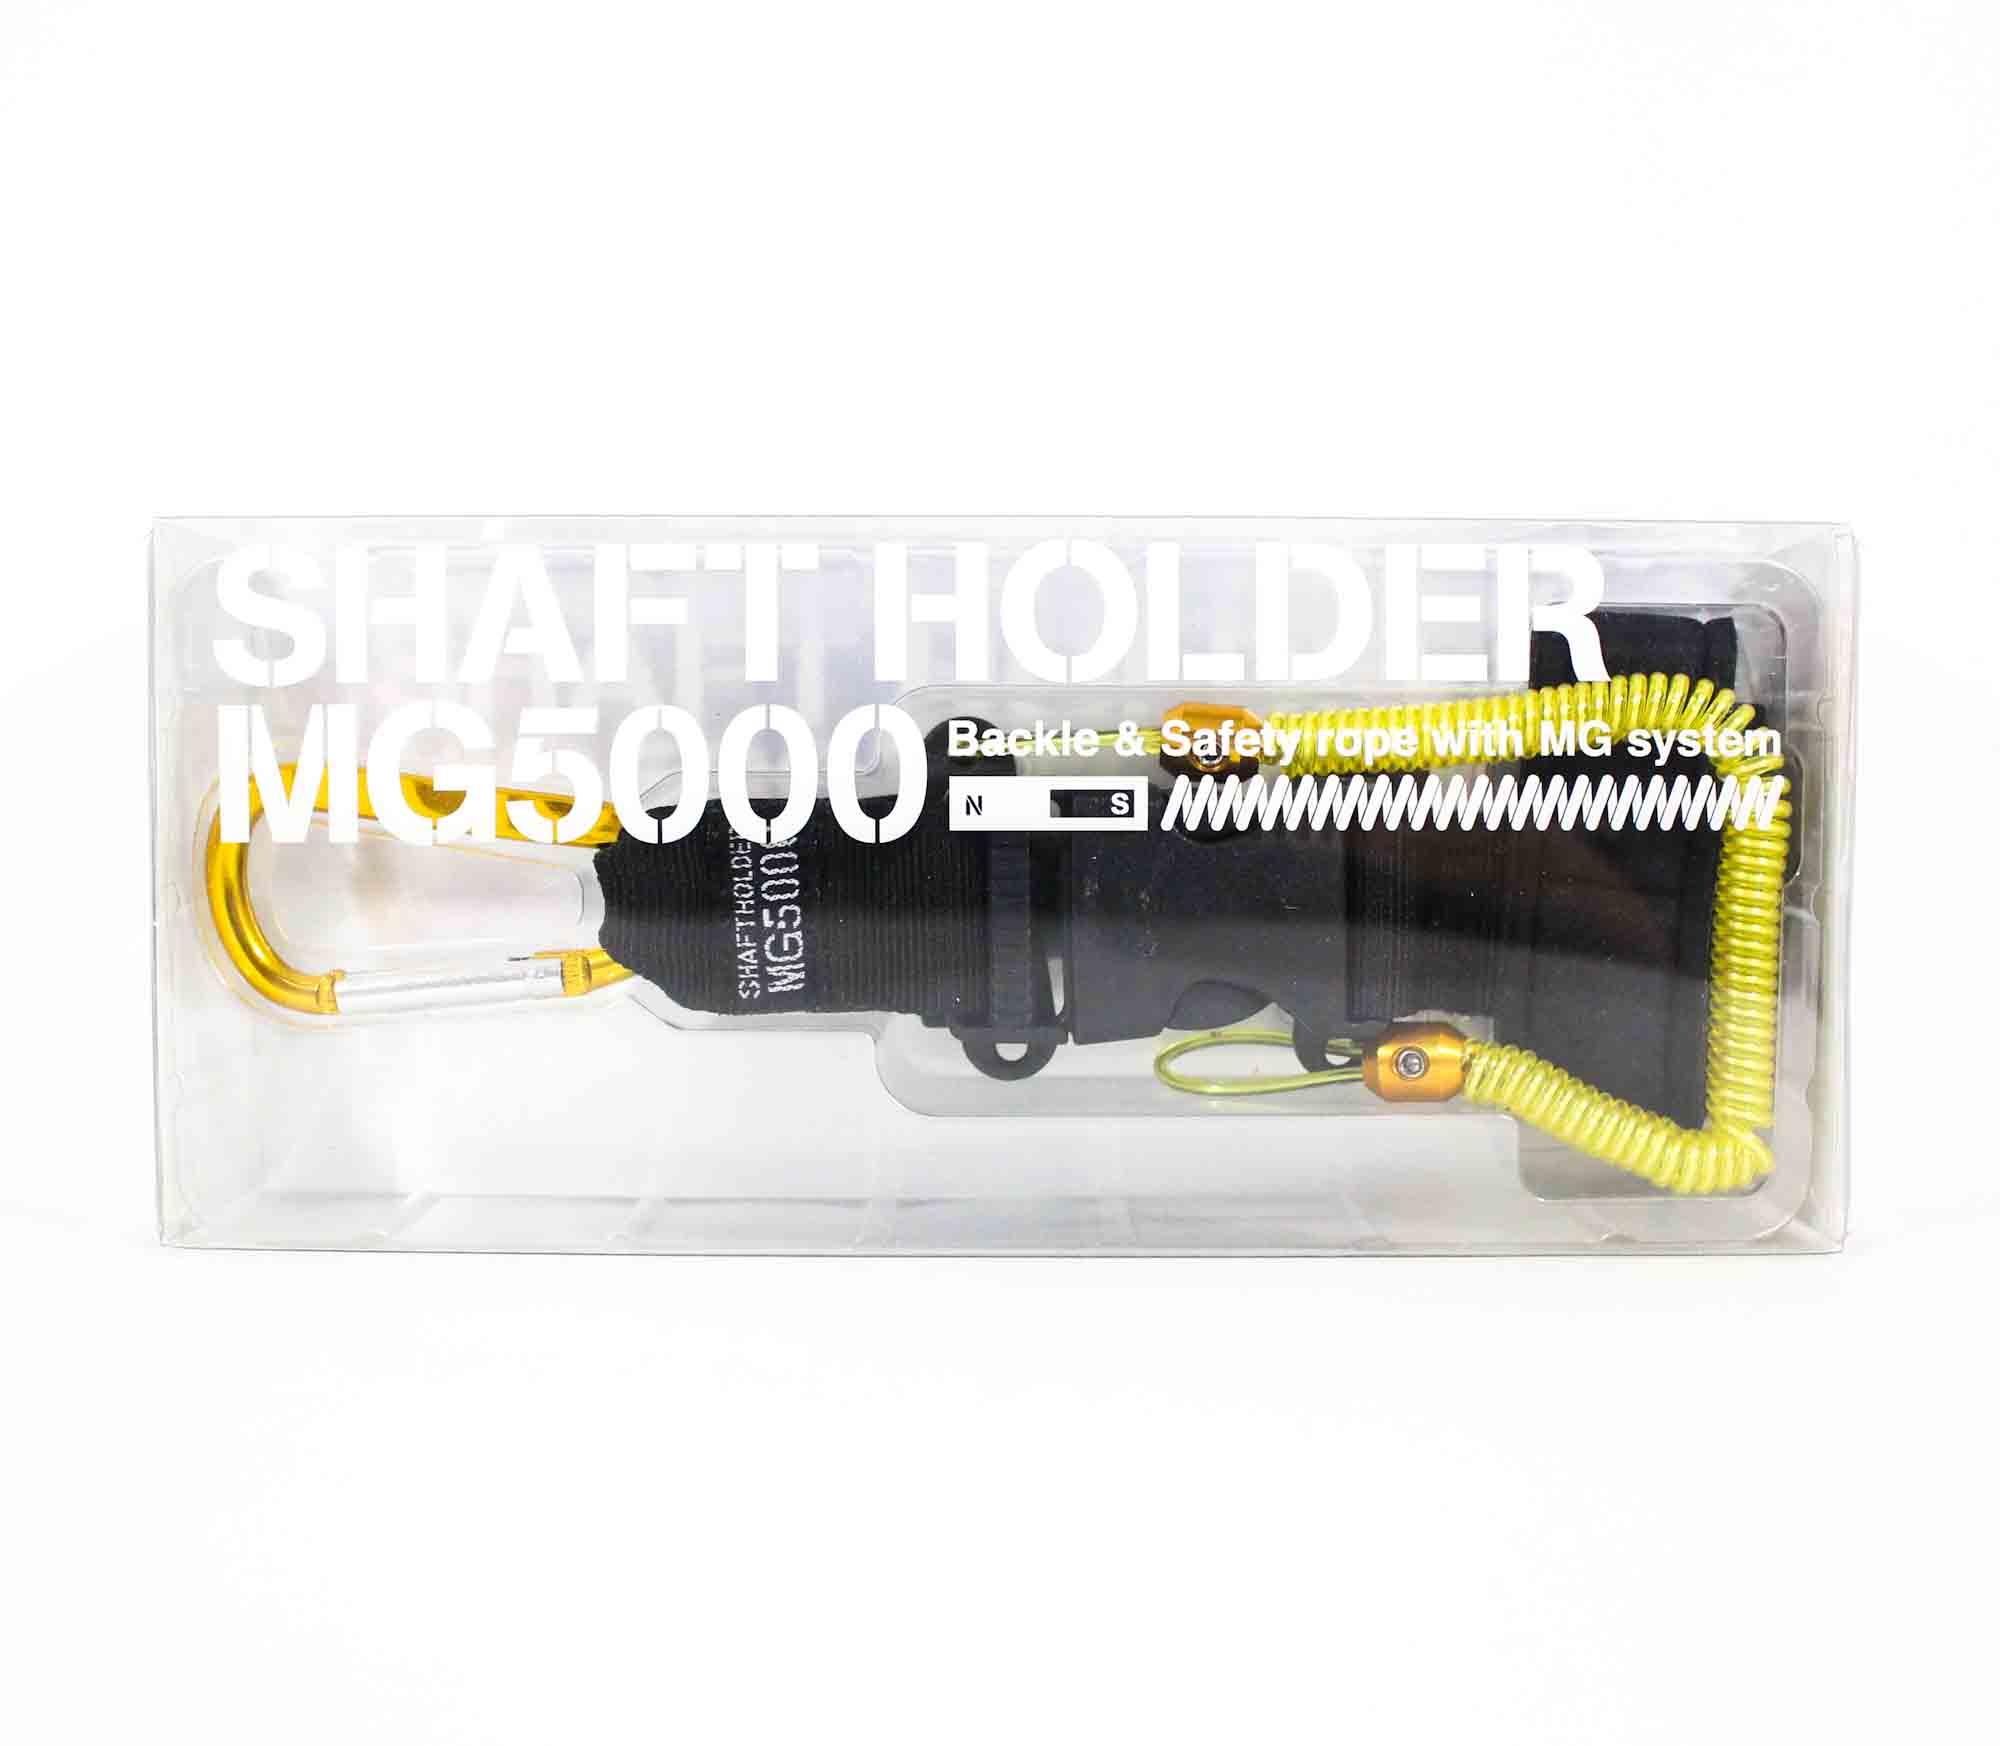 Daiichi #33262 Shaft Holder MG 5000 Magnet System 120 cm Yellow (2628)